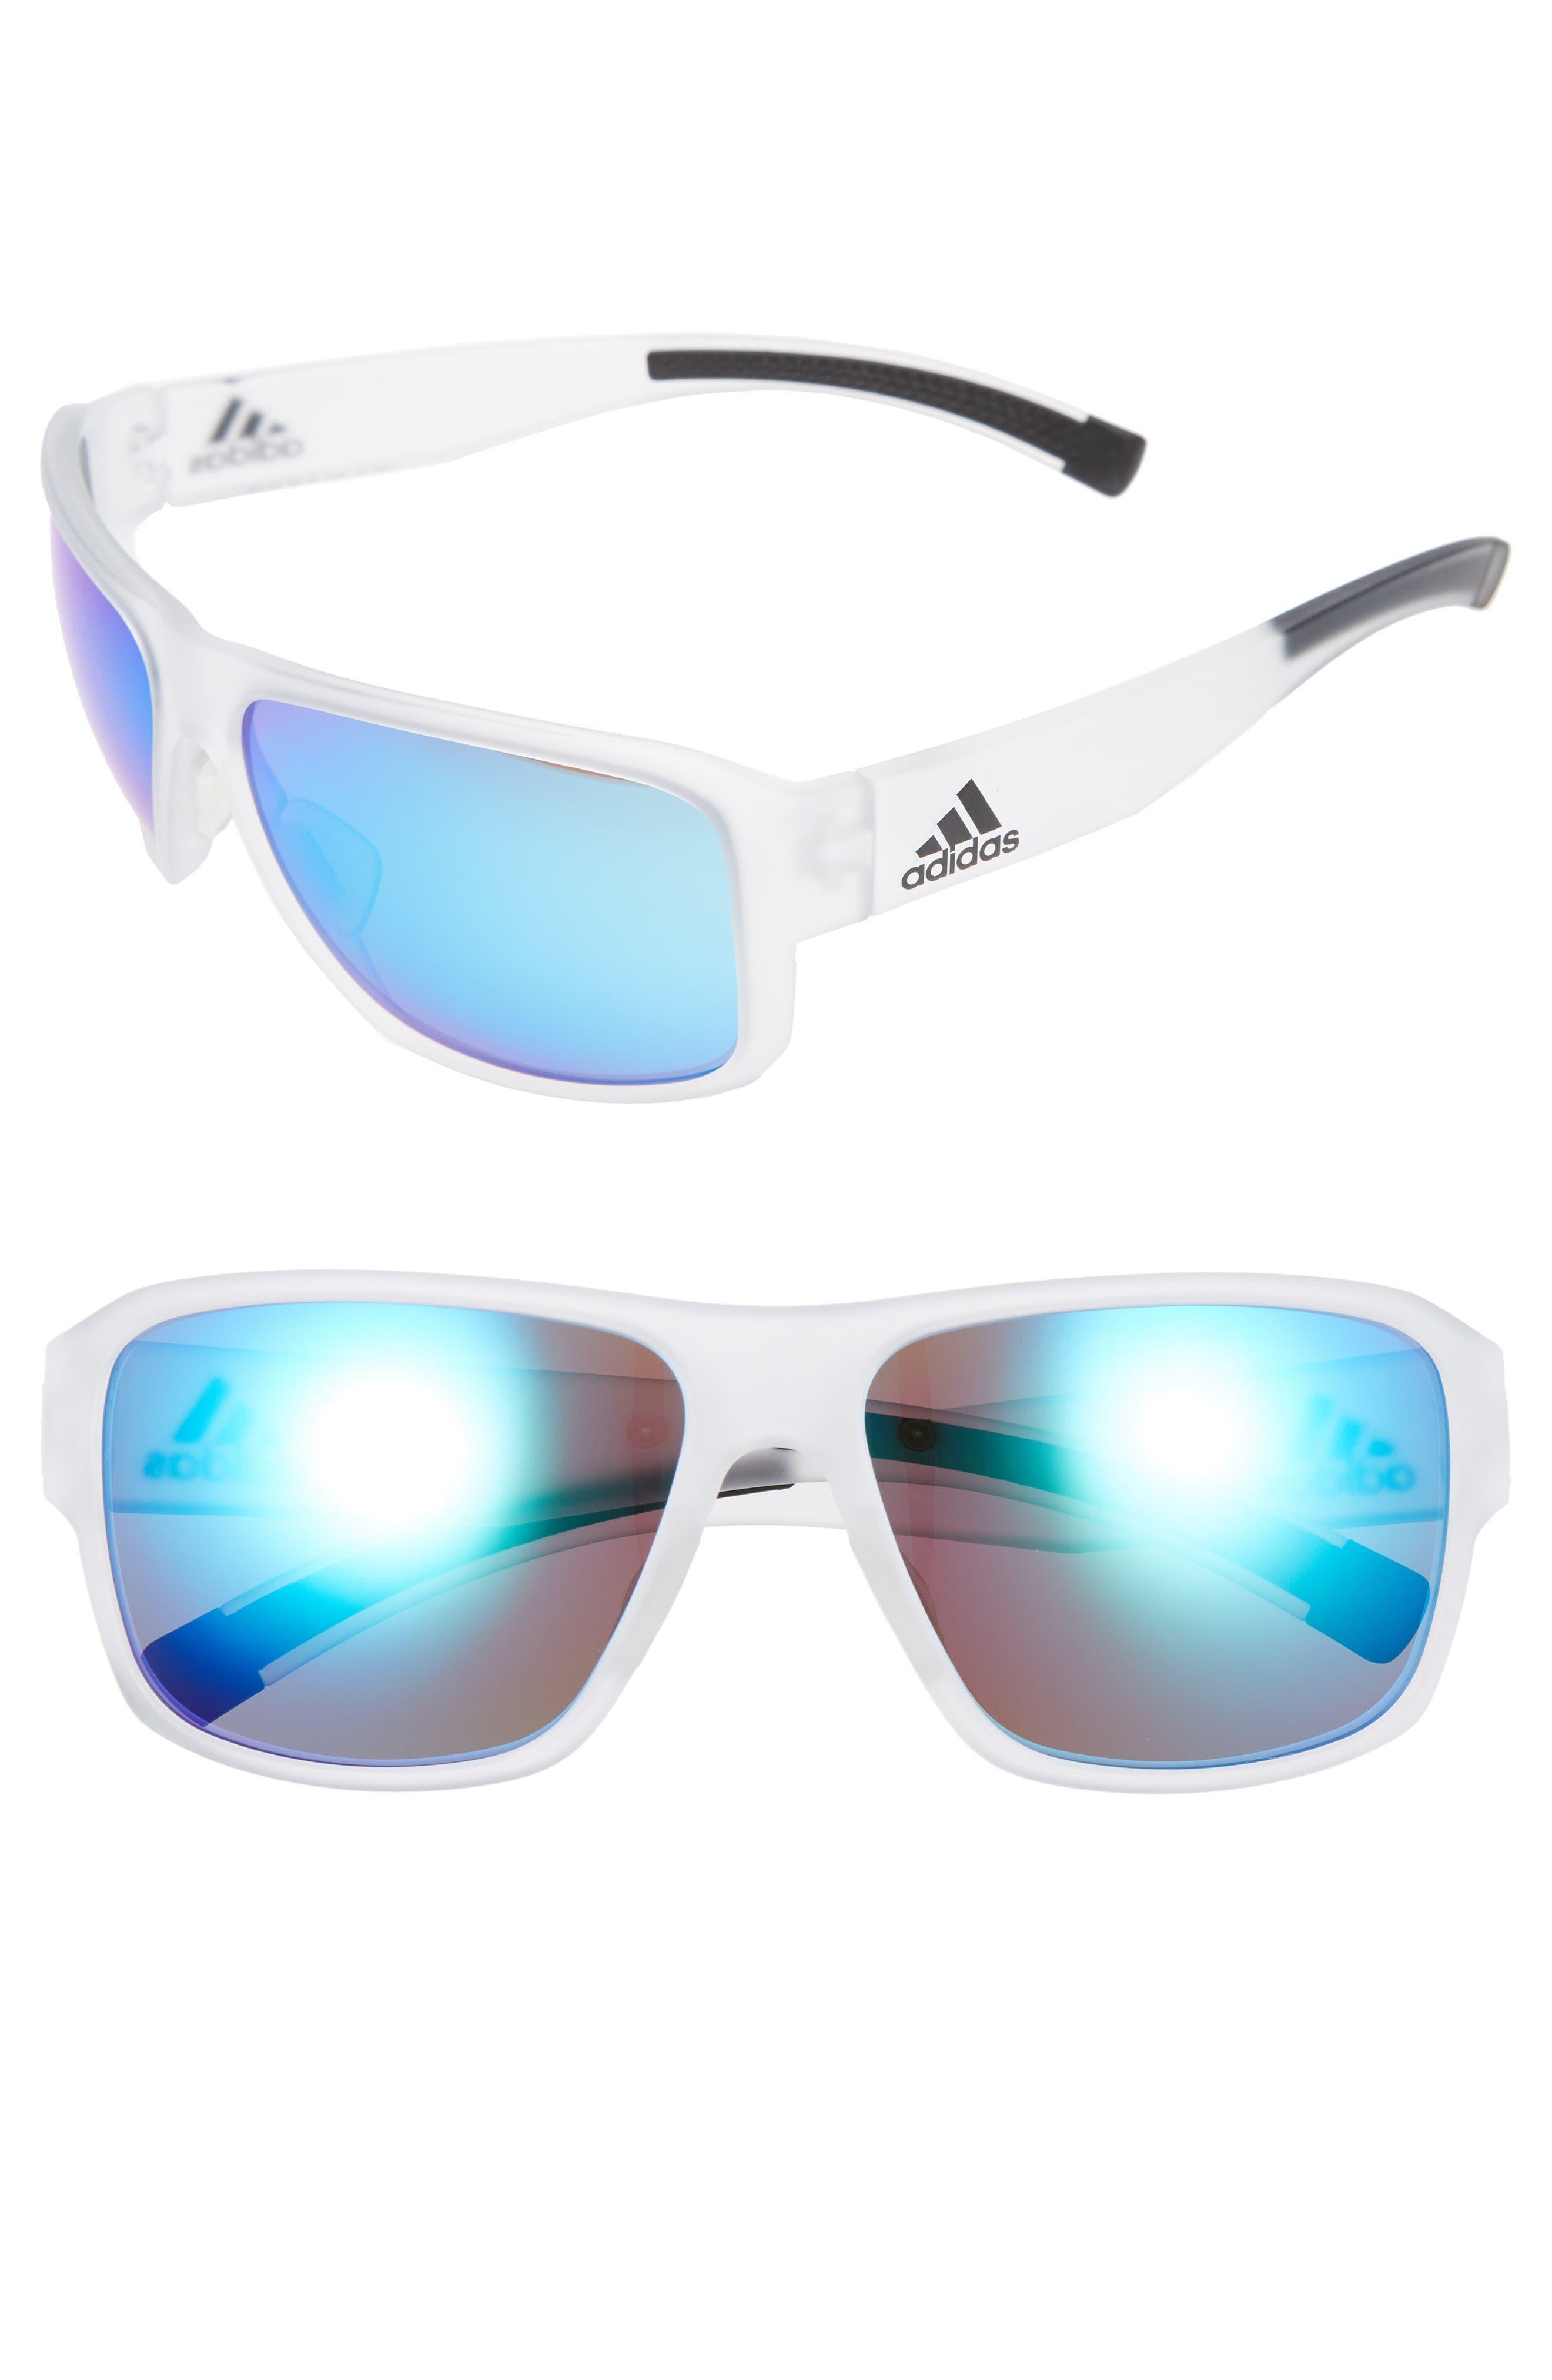 adidas Jaysor 60mm Sunglasses